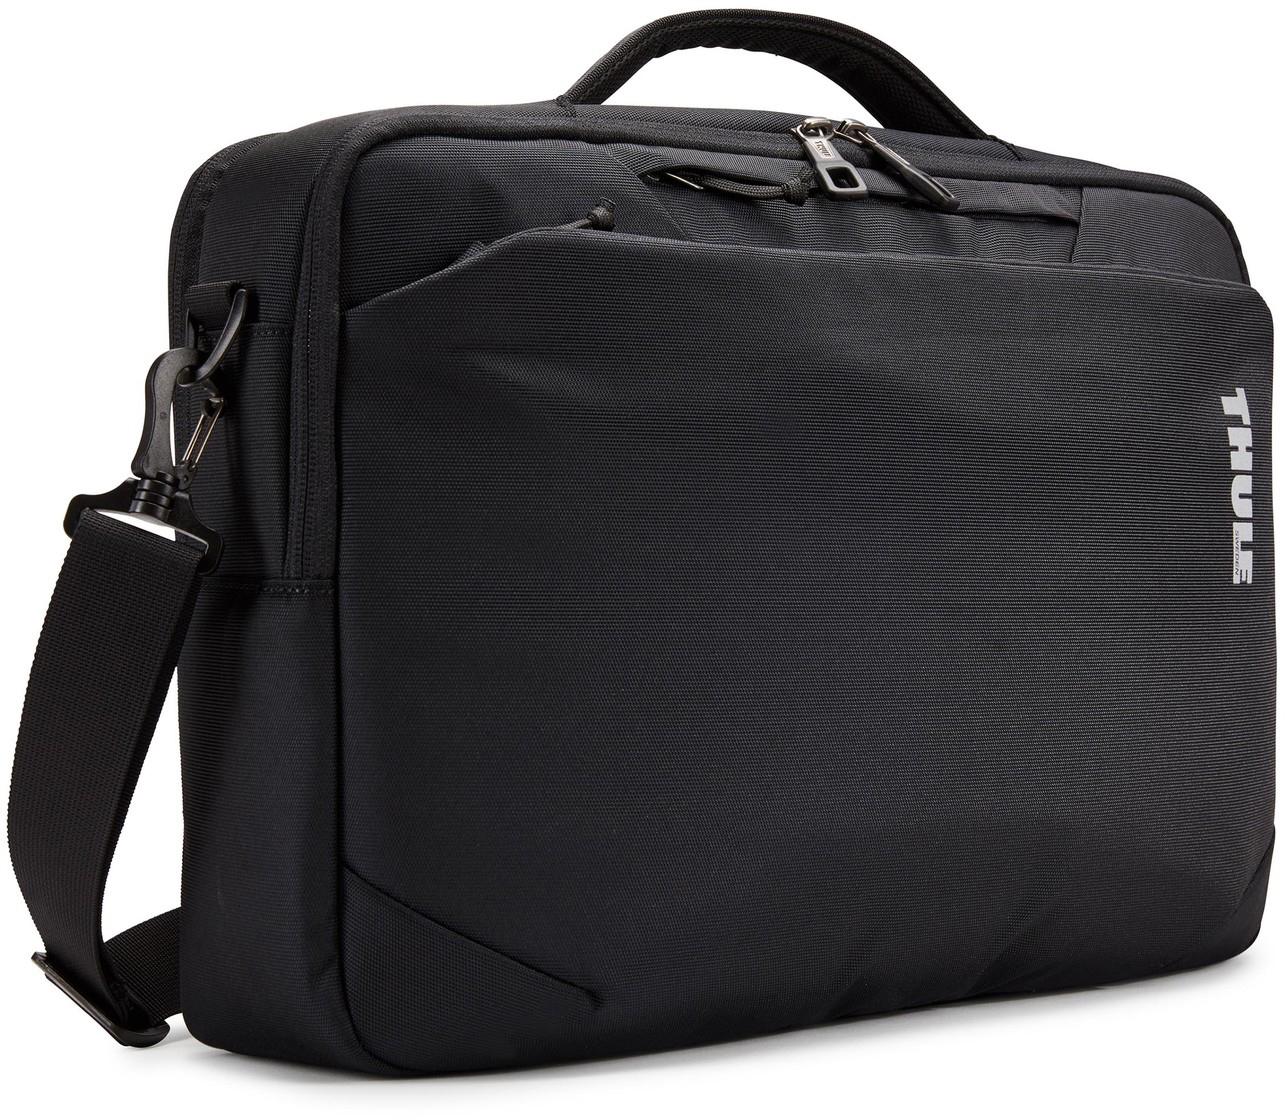 "Городские сумки Thule Сумка для ноутбука Thule Subterra Laptop Bag 15.6"" 689539_sized_1800x1200_rev_2.jpg"